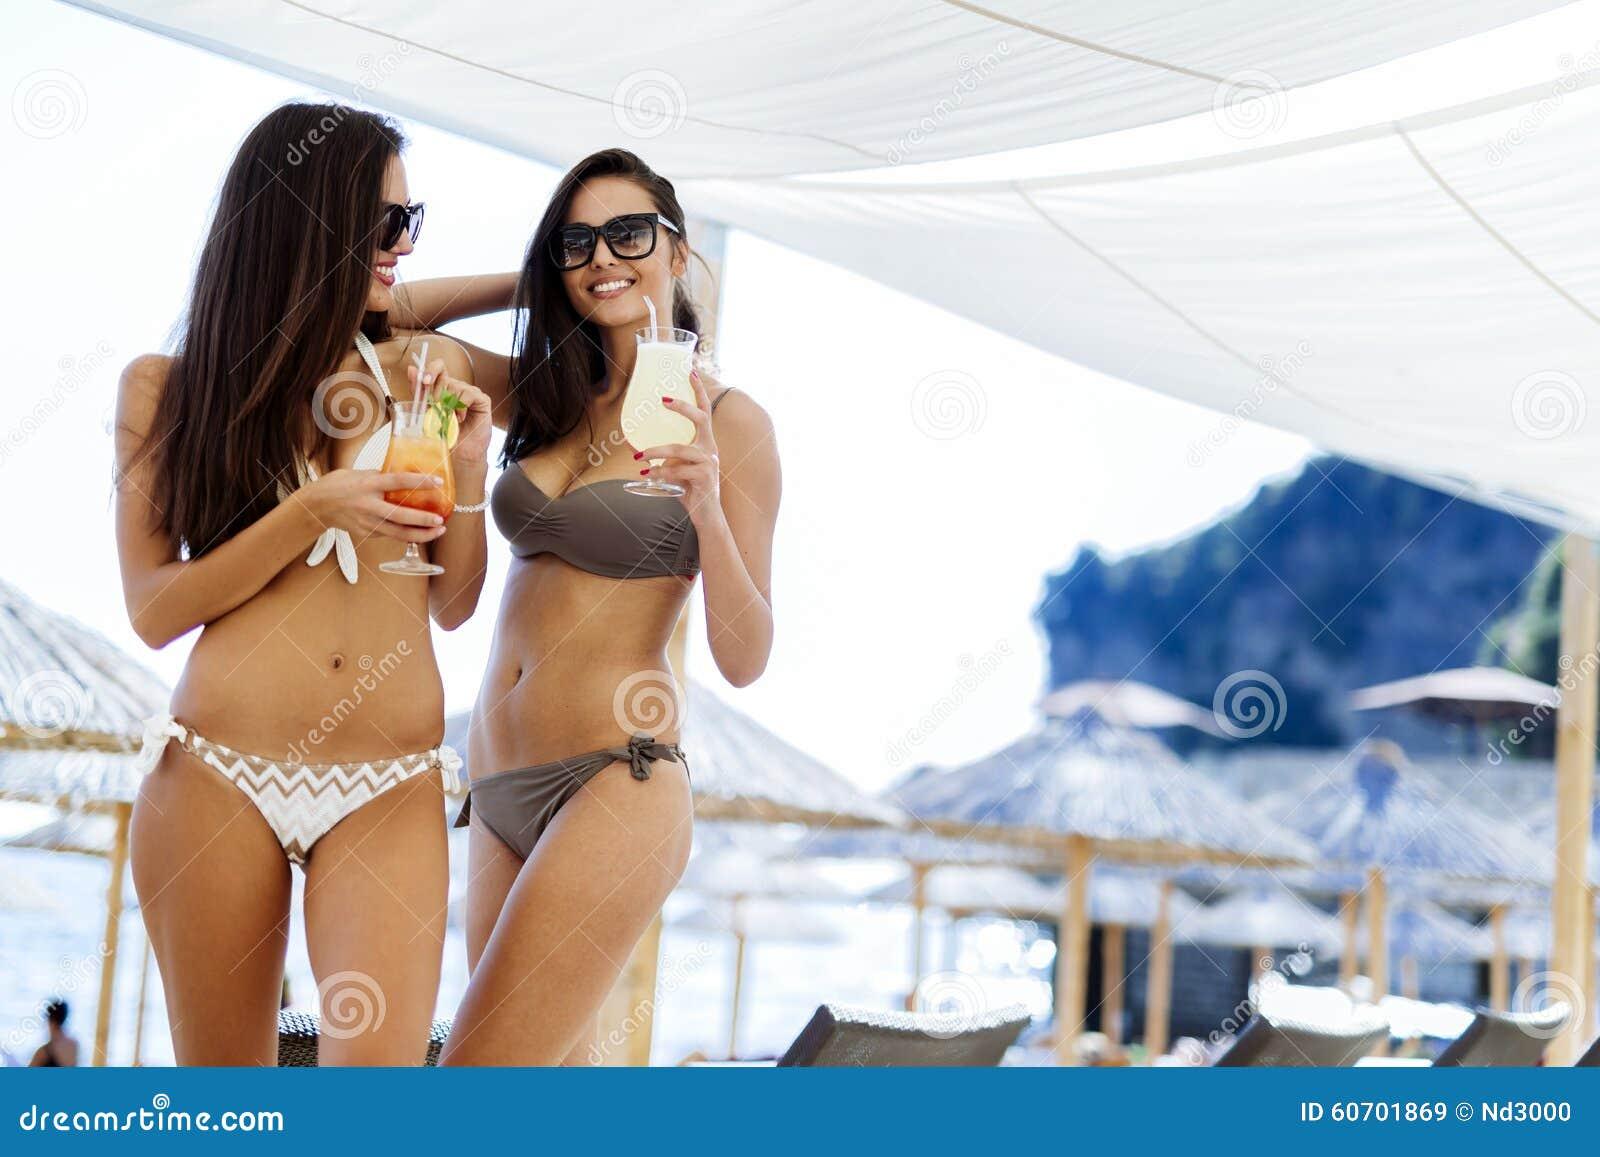 Chubby girls posing nude